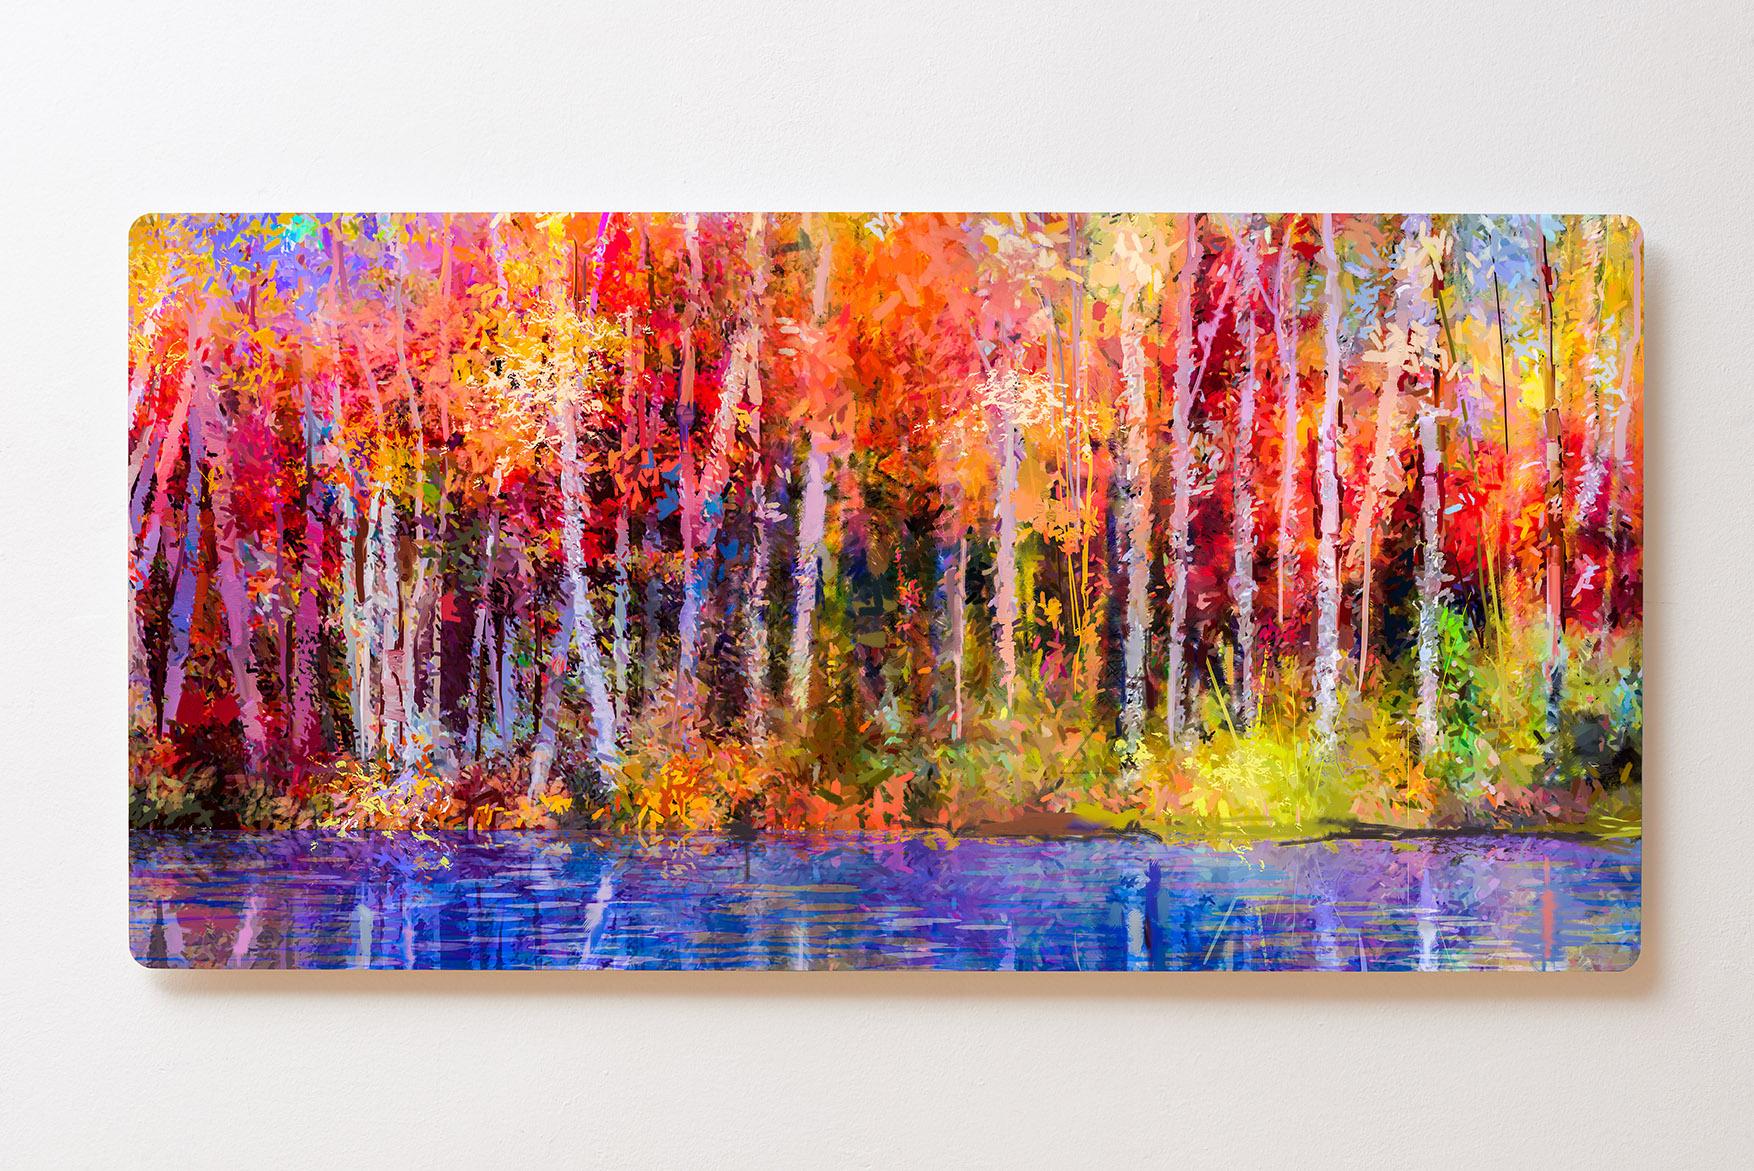 Magnettafel BACKLIGHT 120x60cm Motiv-Wandbild M147 Gemälde Wald Bäume